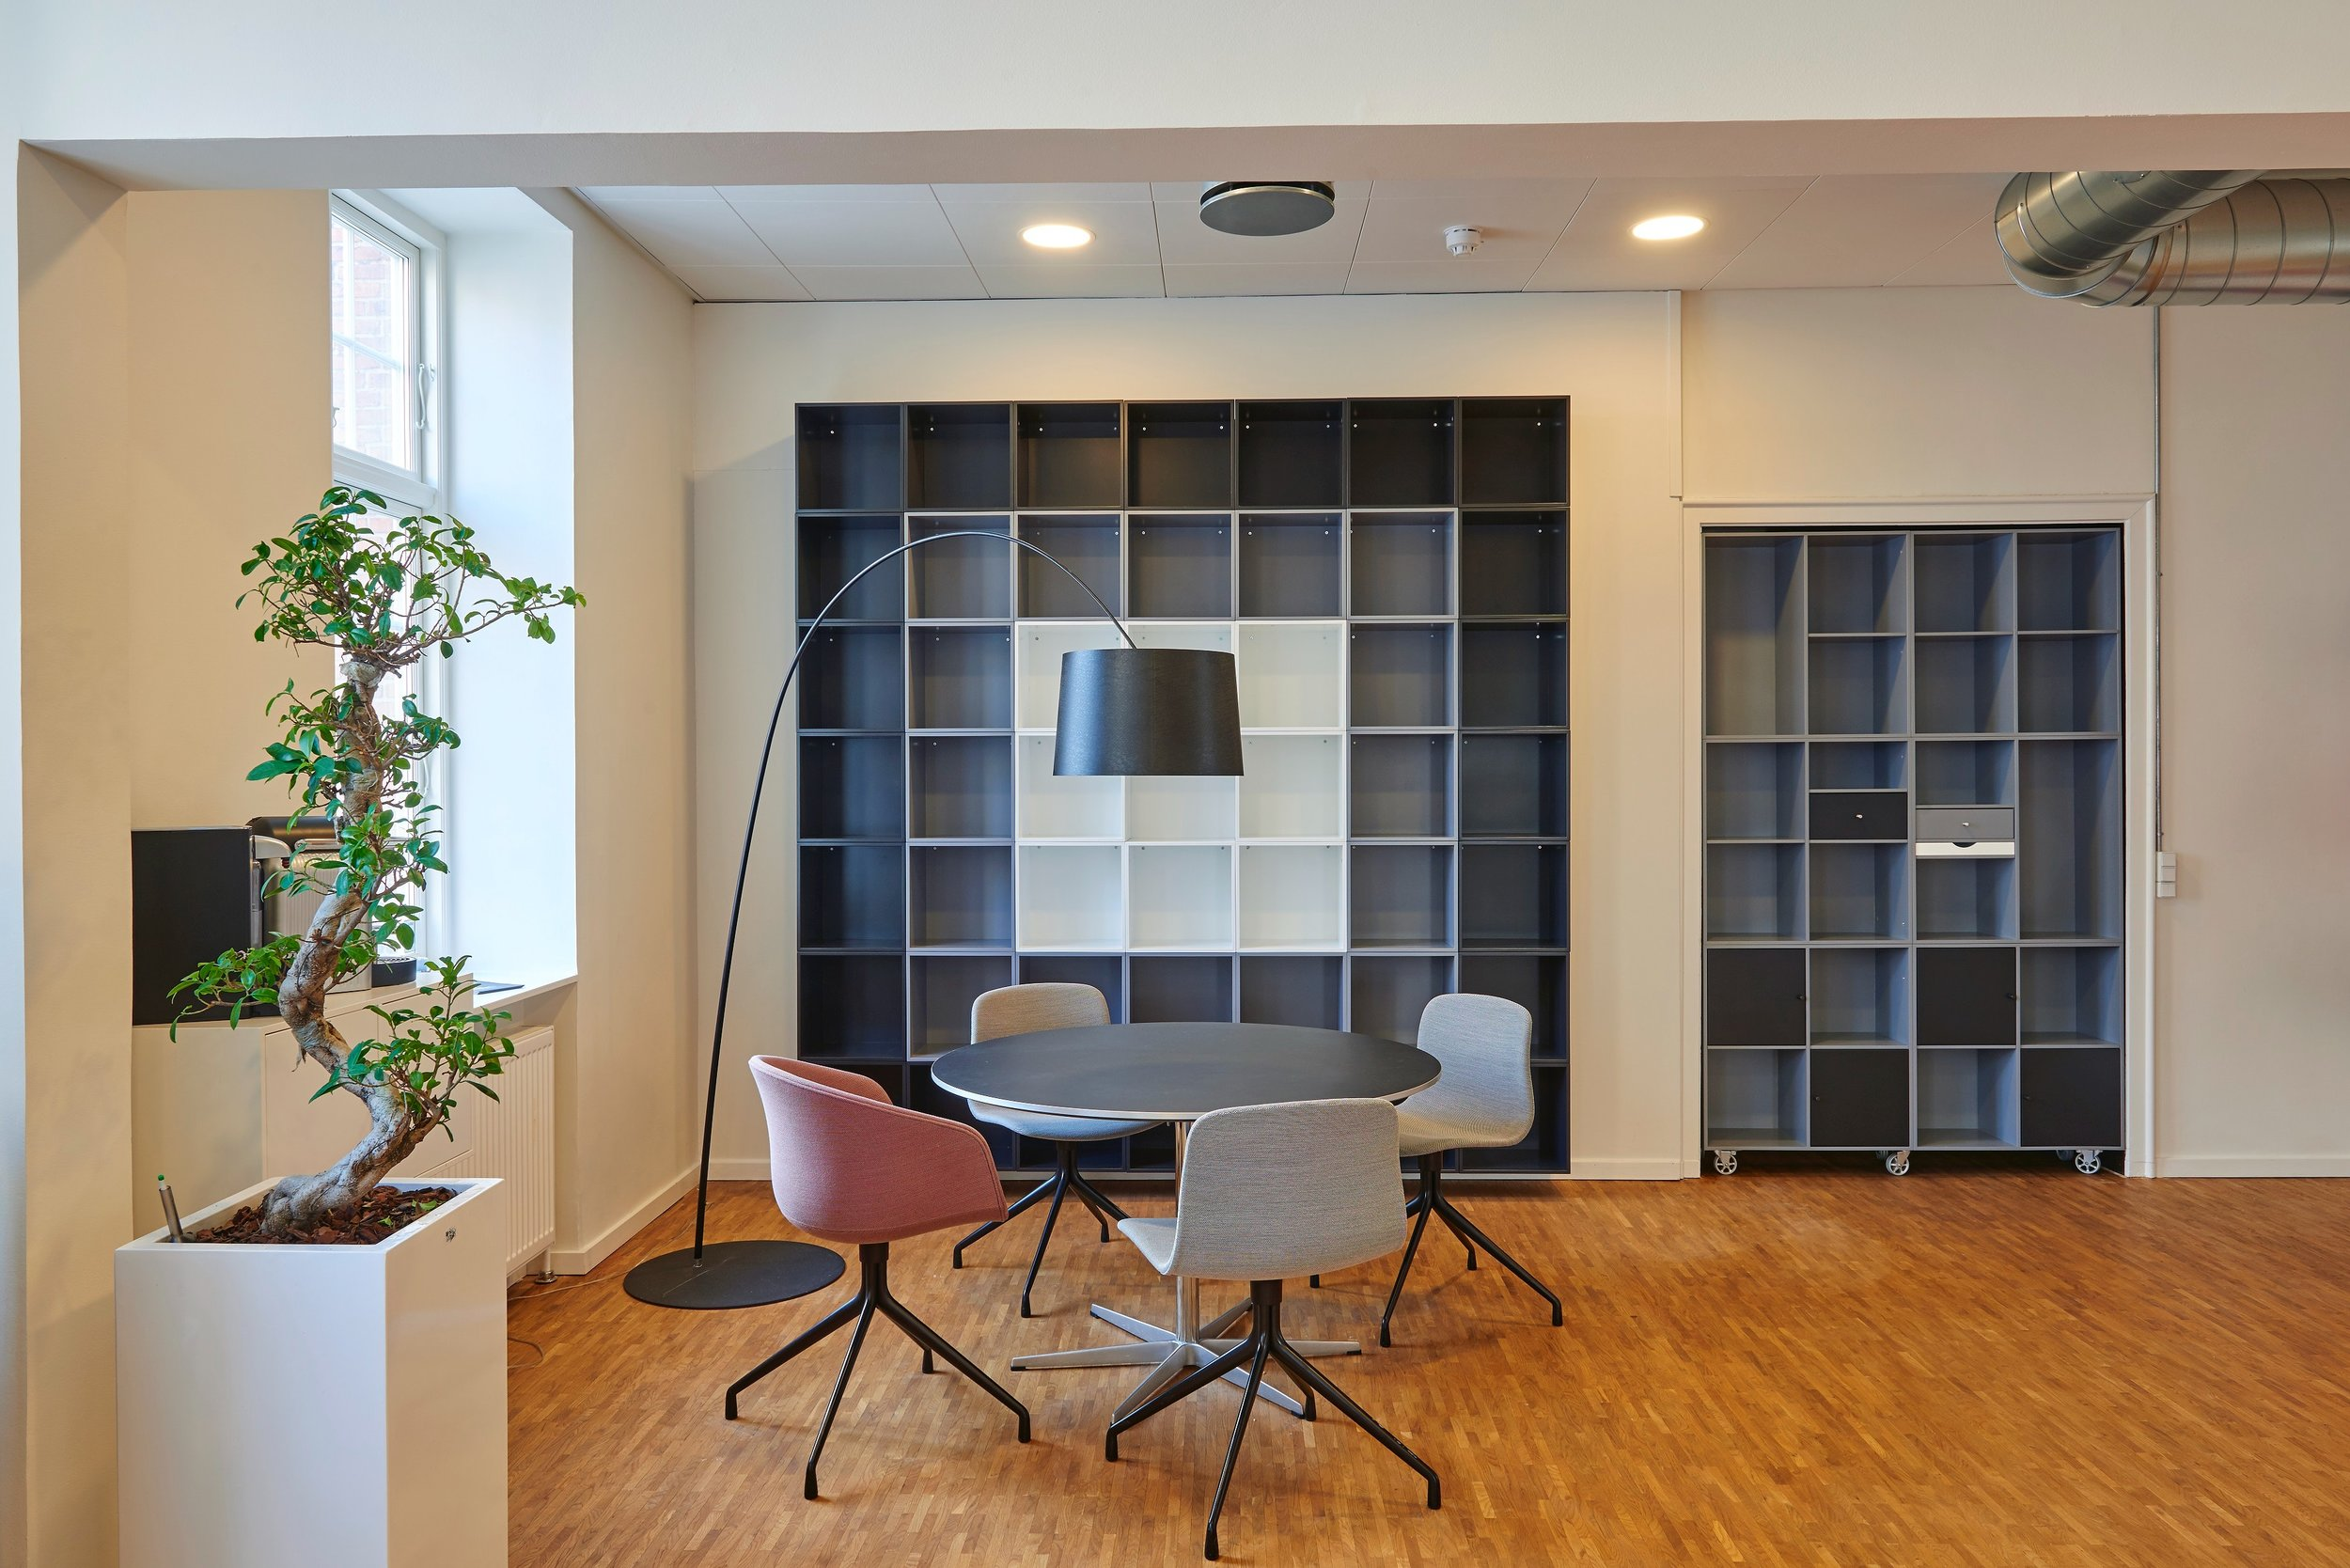 architecture-book-shelves-bookcase-245240.jpg